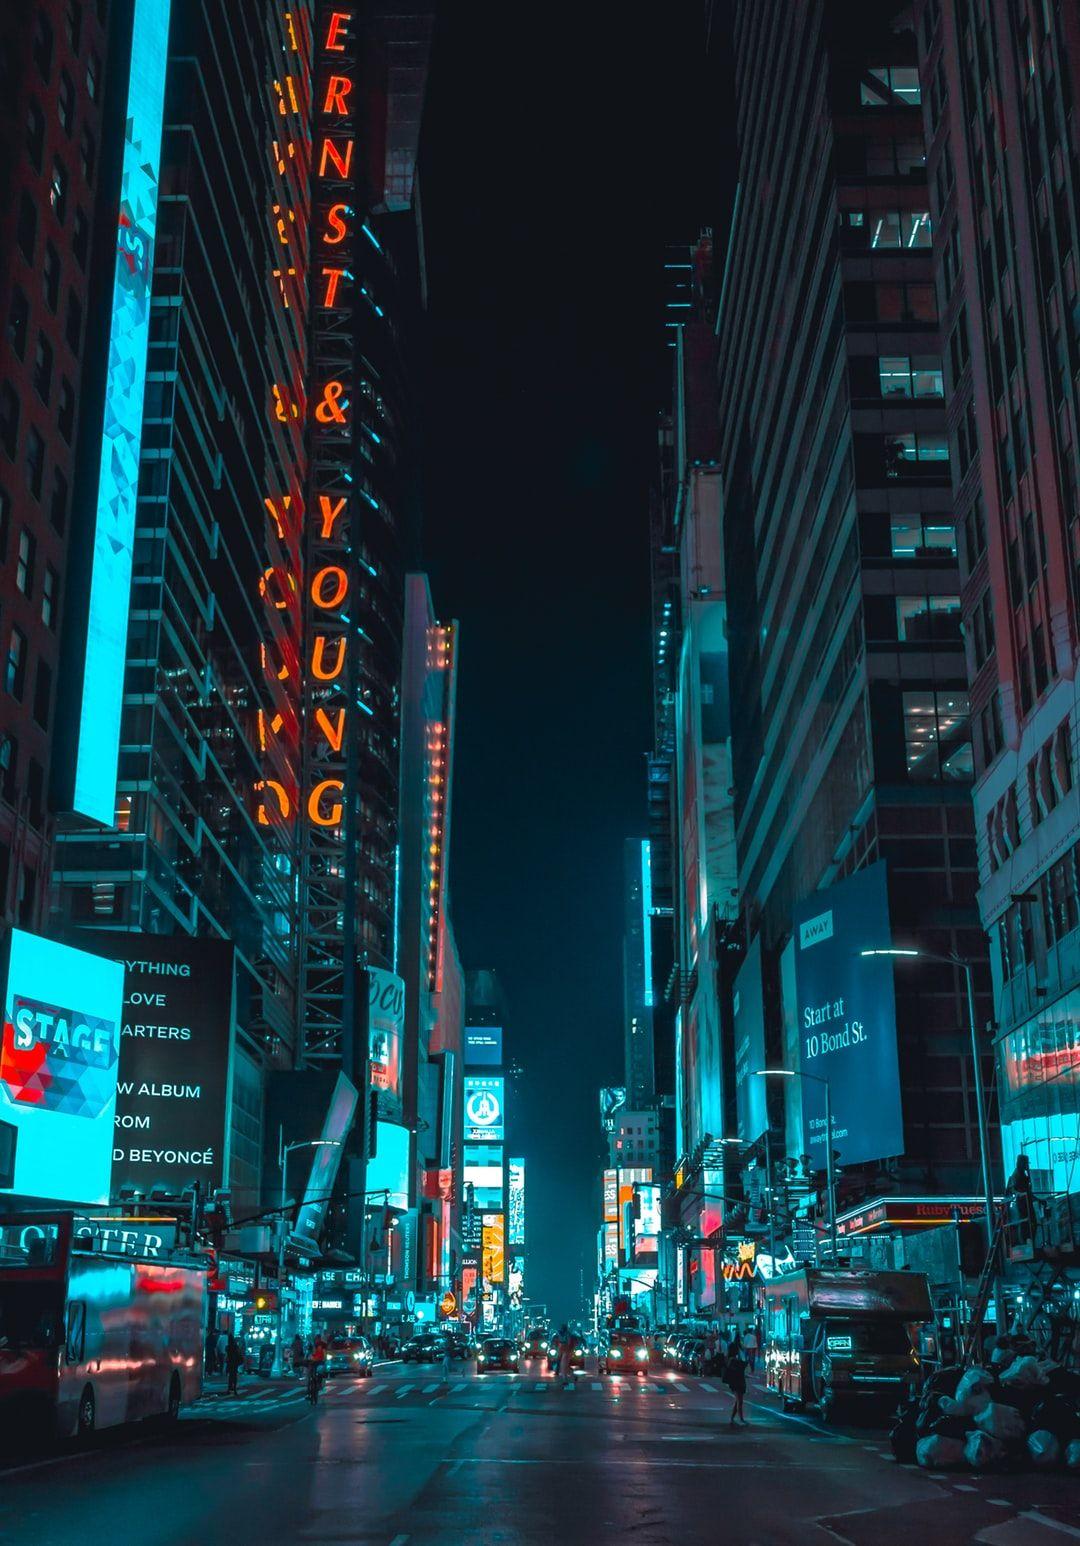 New York City Times Square Street Photography Of Street Photography Of Vehicles Traveling On Road City Lights Wallpaper Neon Wallpaper City Wallpaper